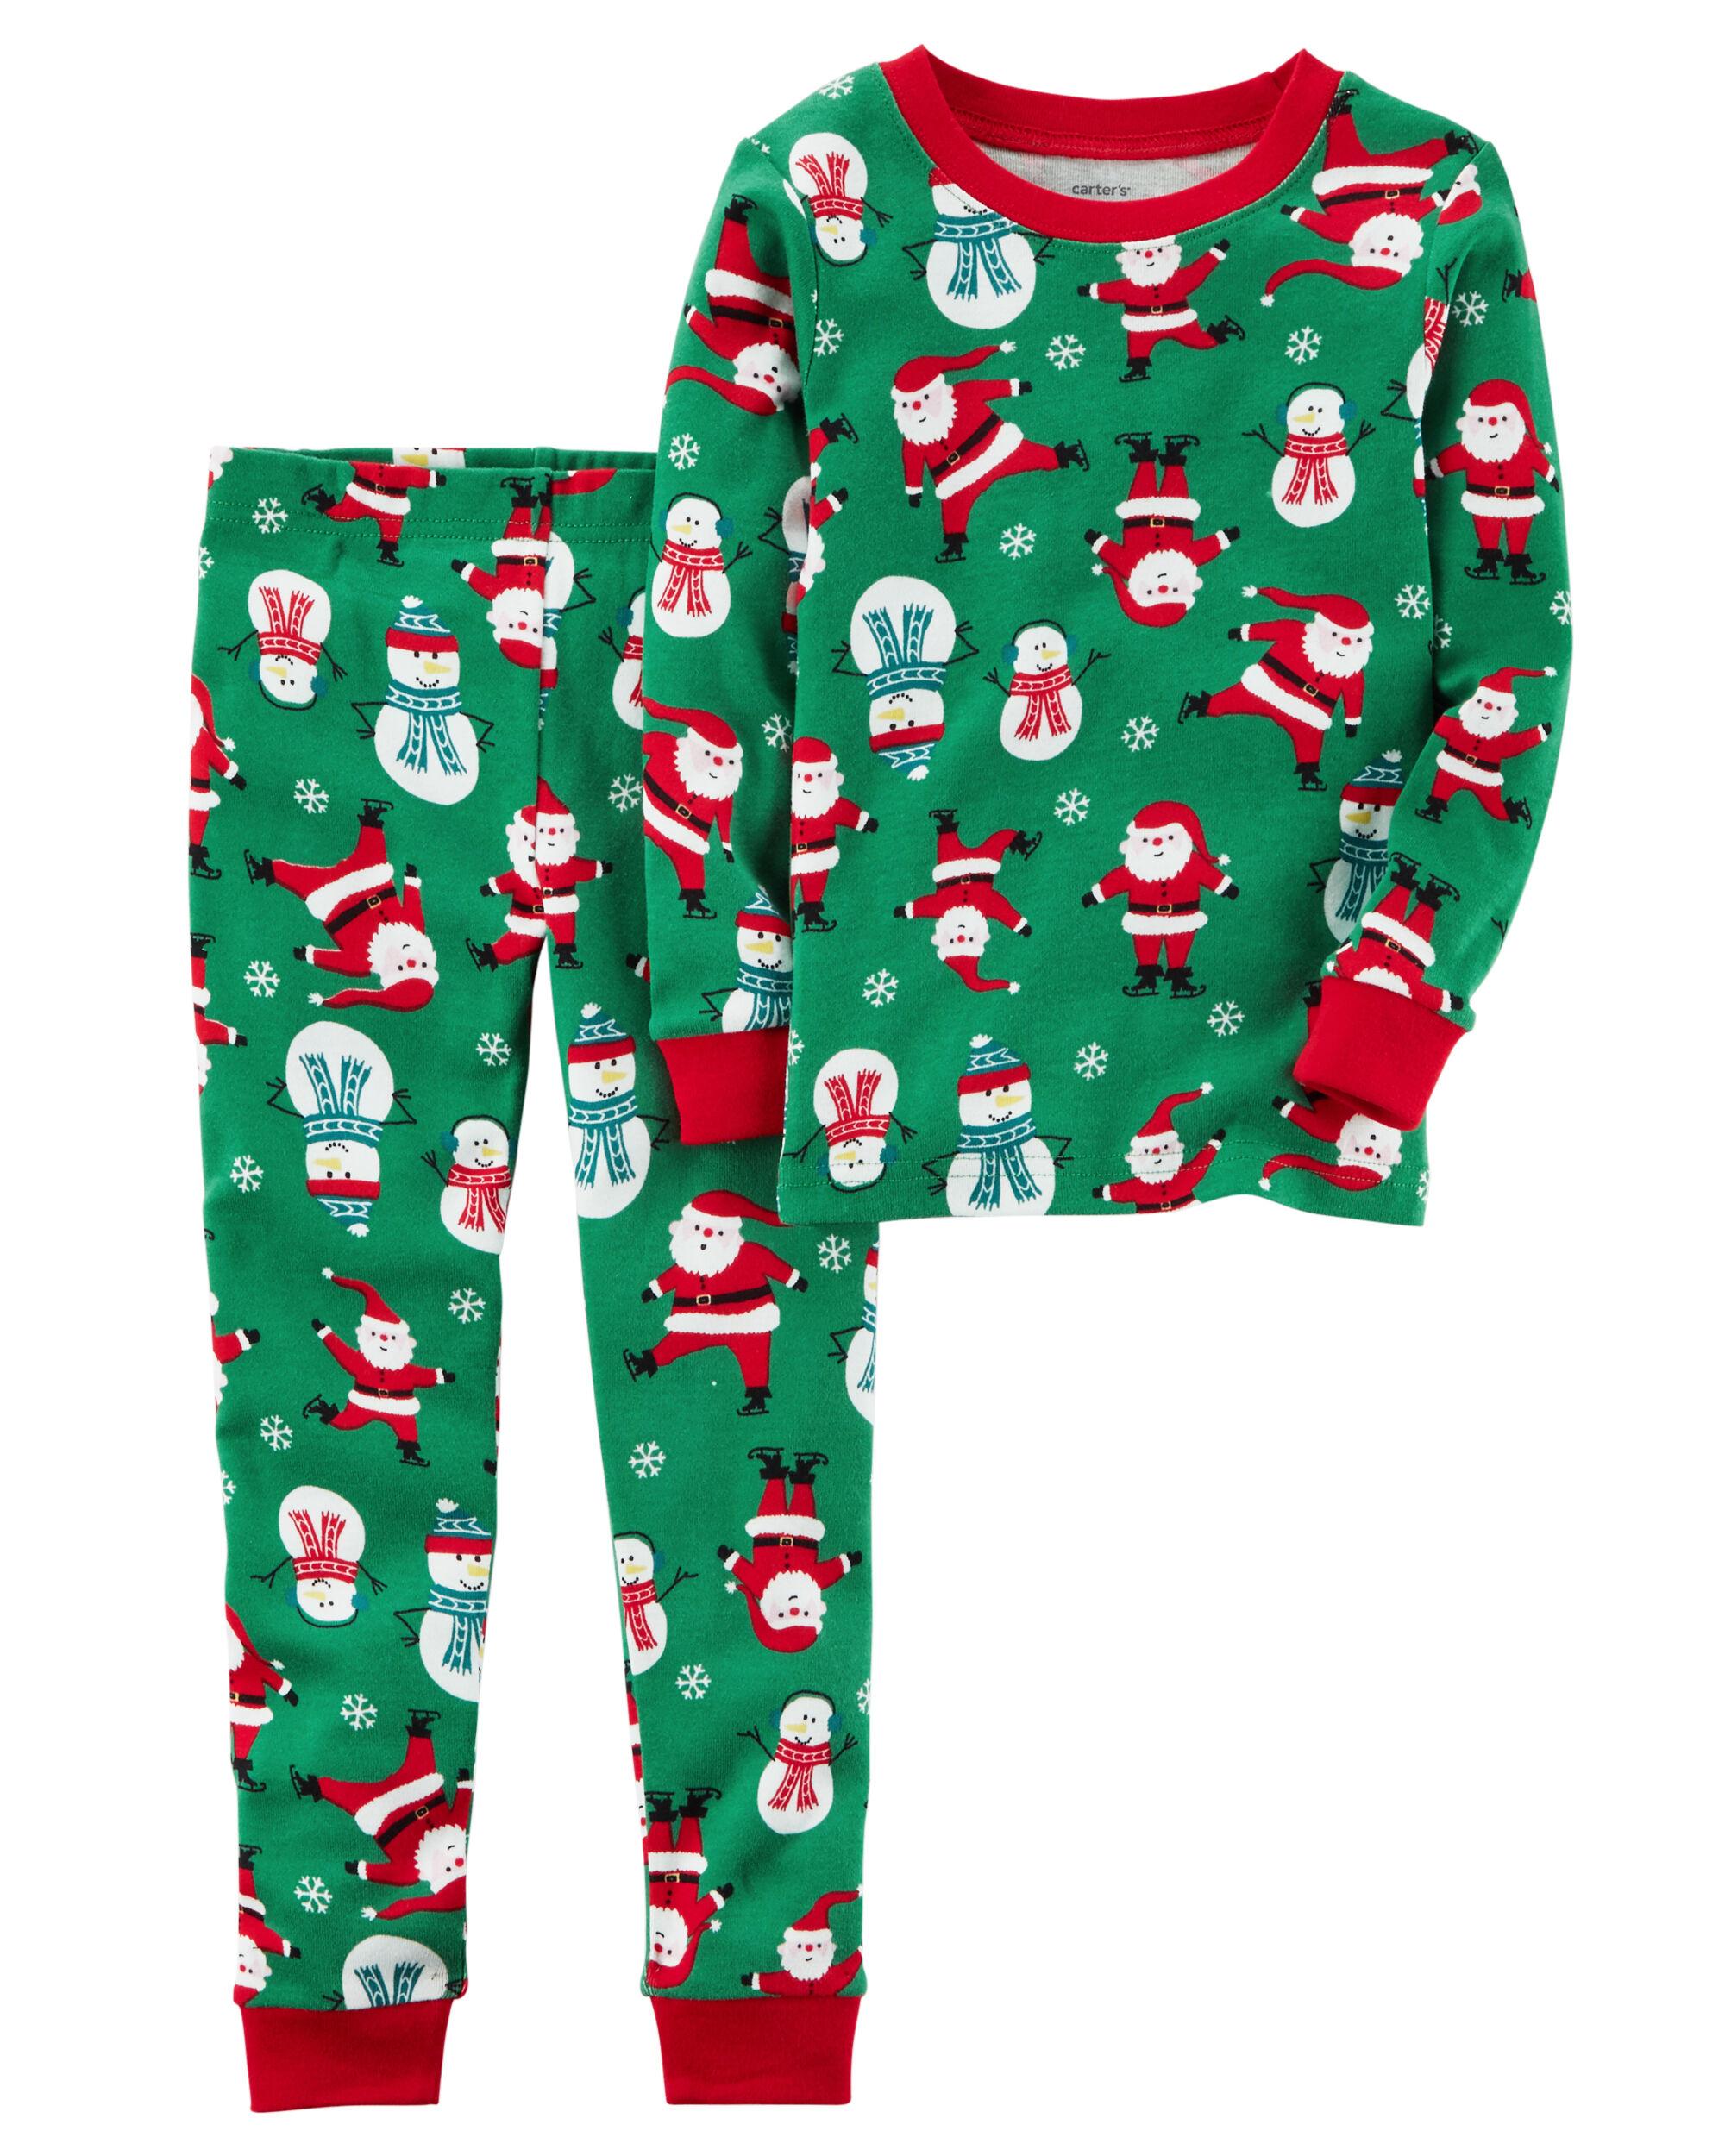 2 piece christmas snug fit cotton pjs loading zoom